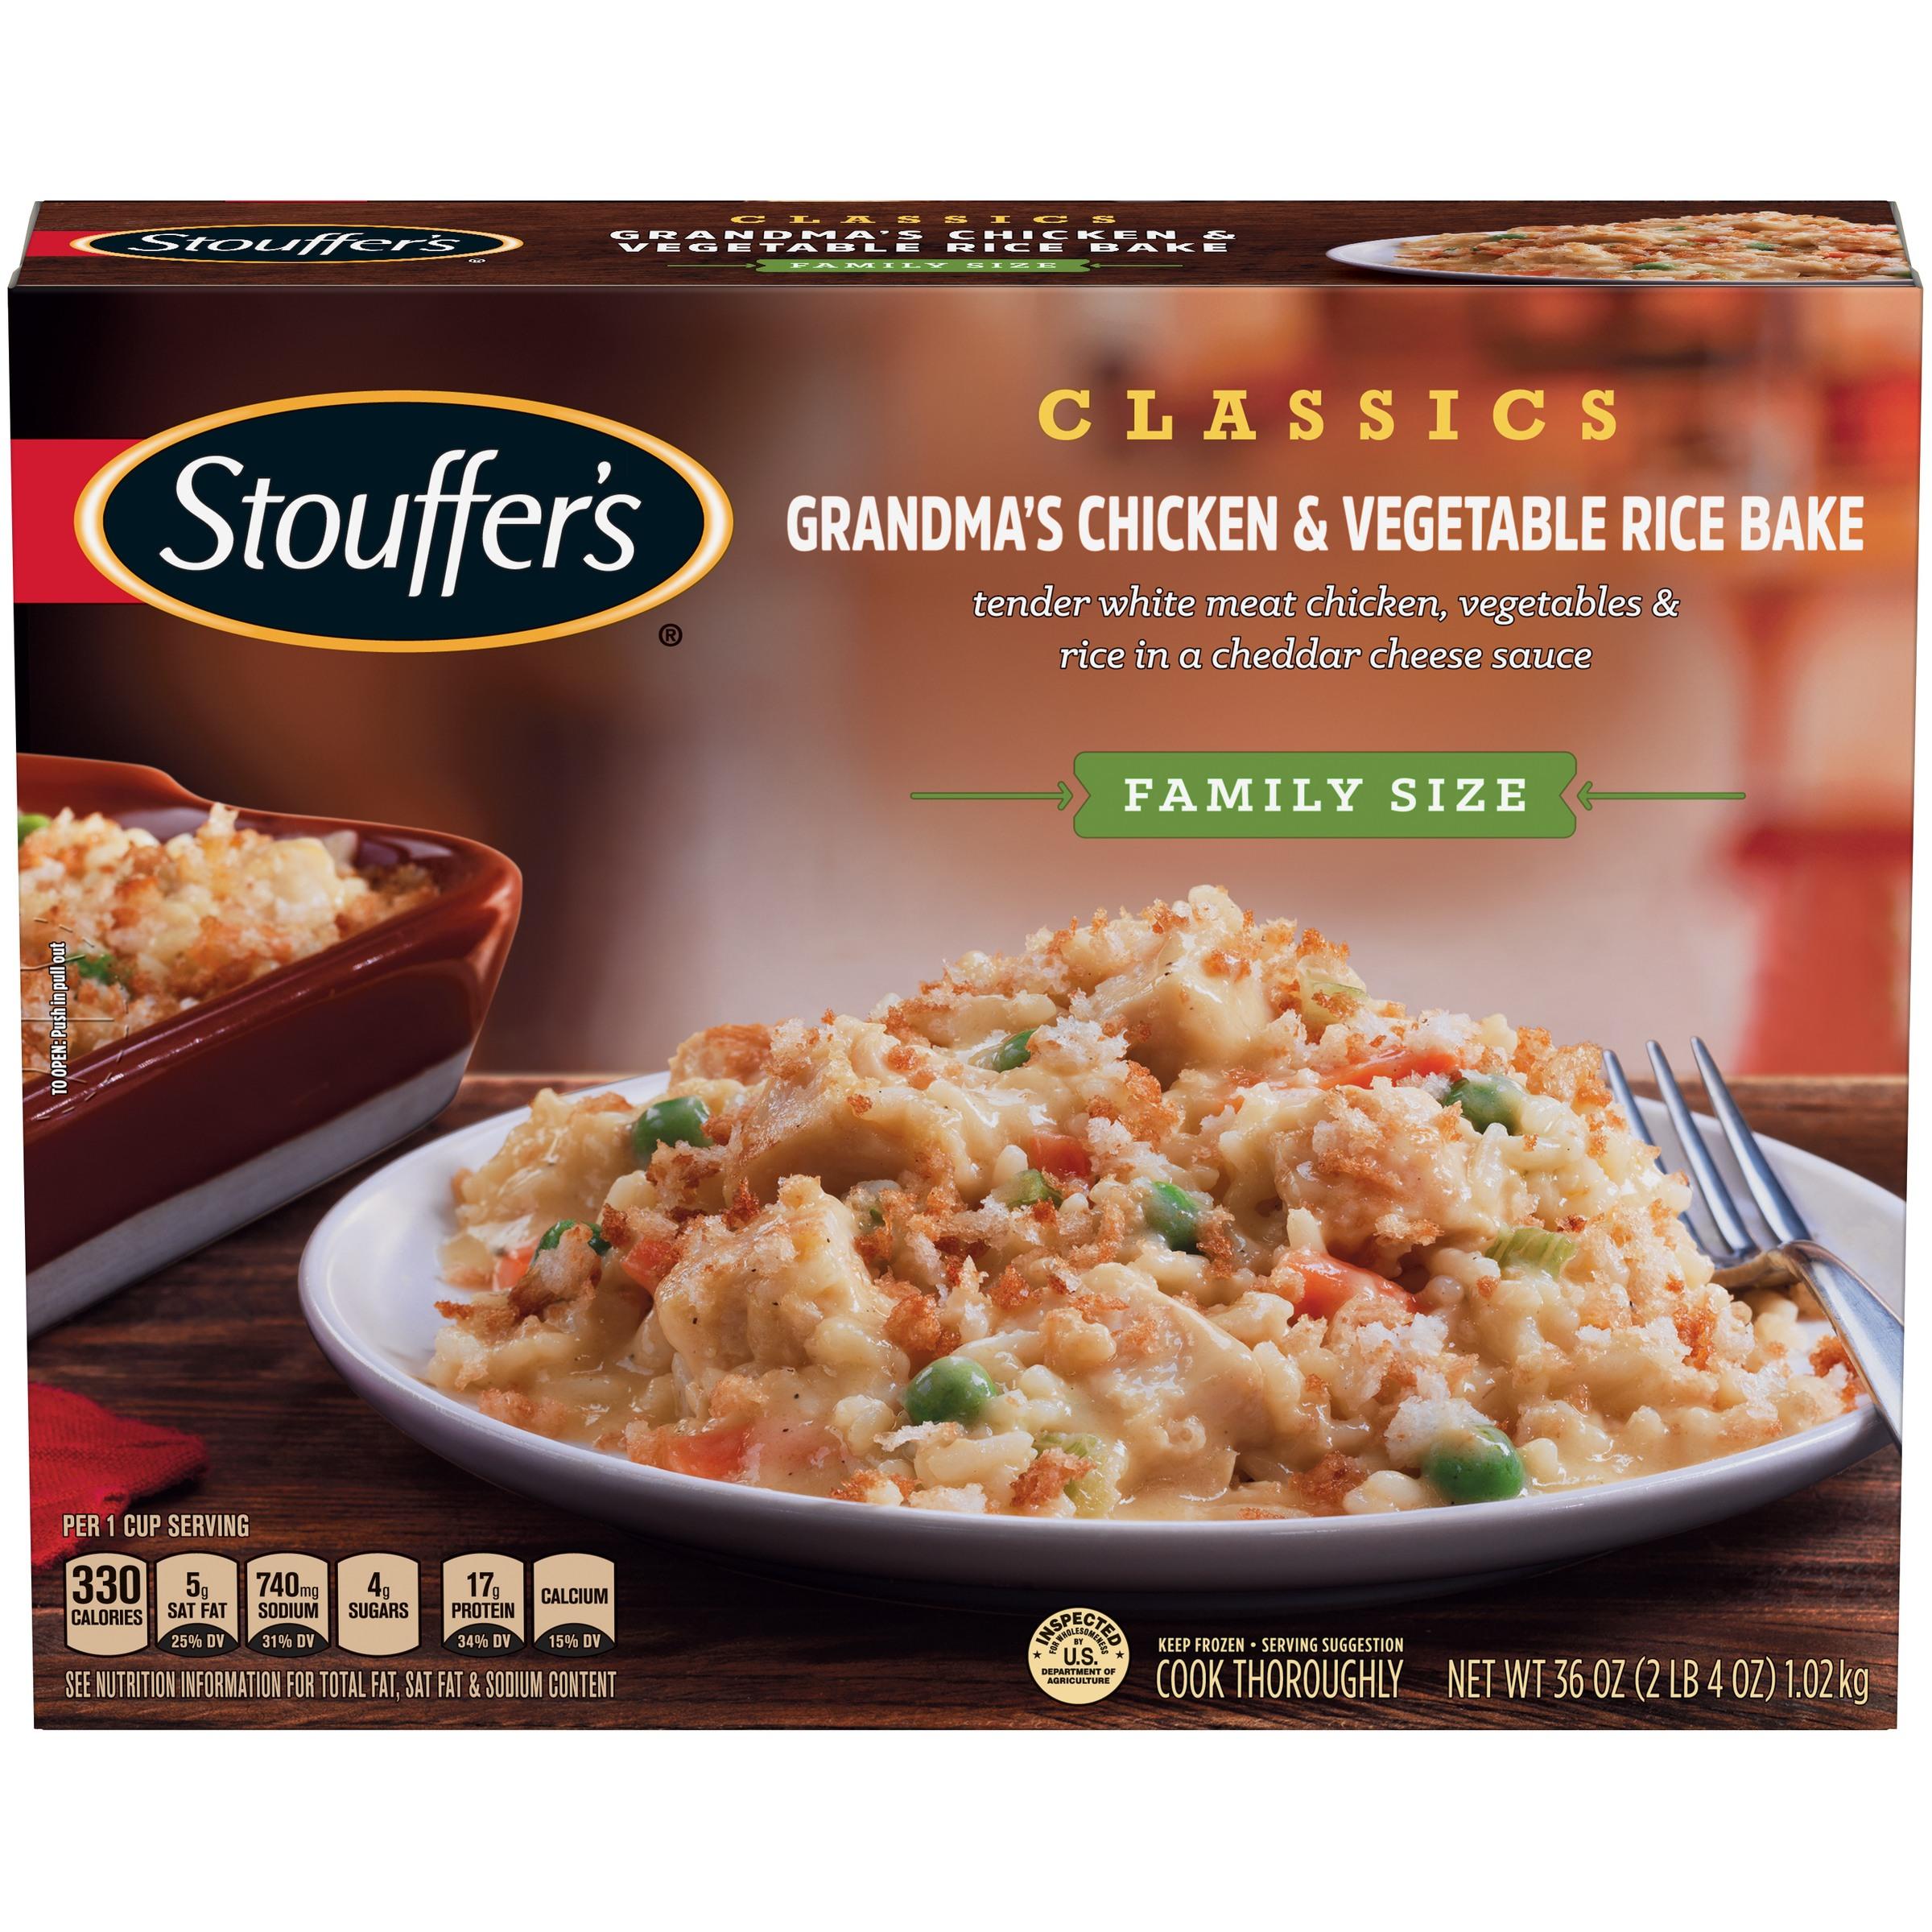 STOUFFER'S CLASSICS Family Size Grandma's Chicken & Vegetable Rice Bake 36 oz. Box